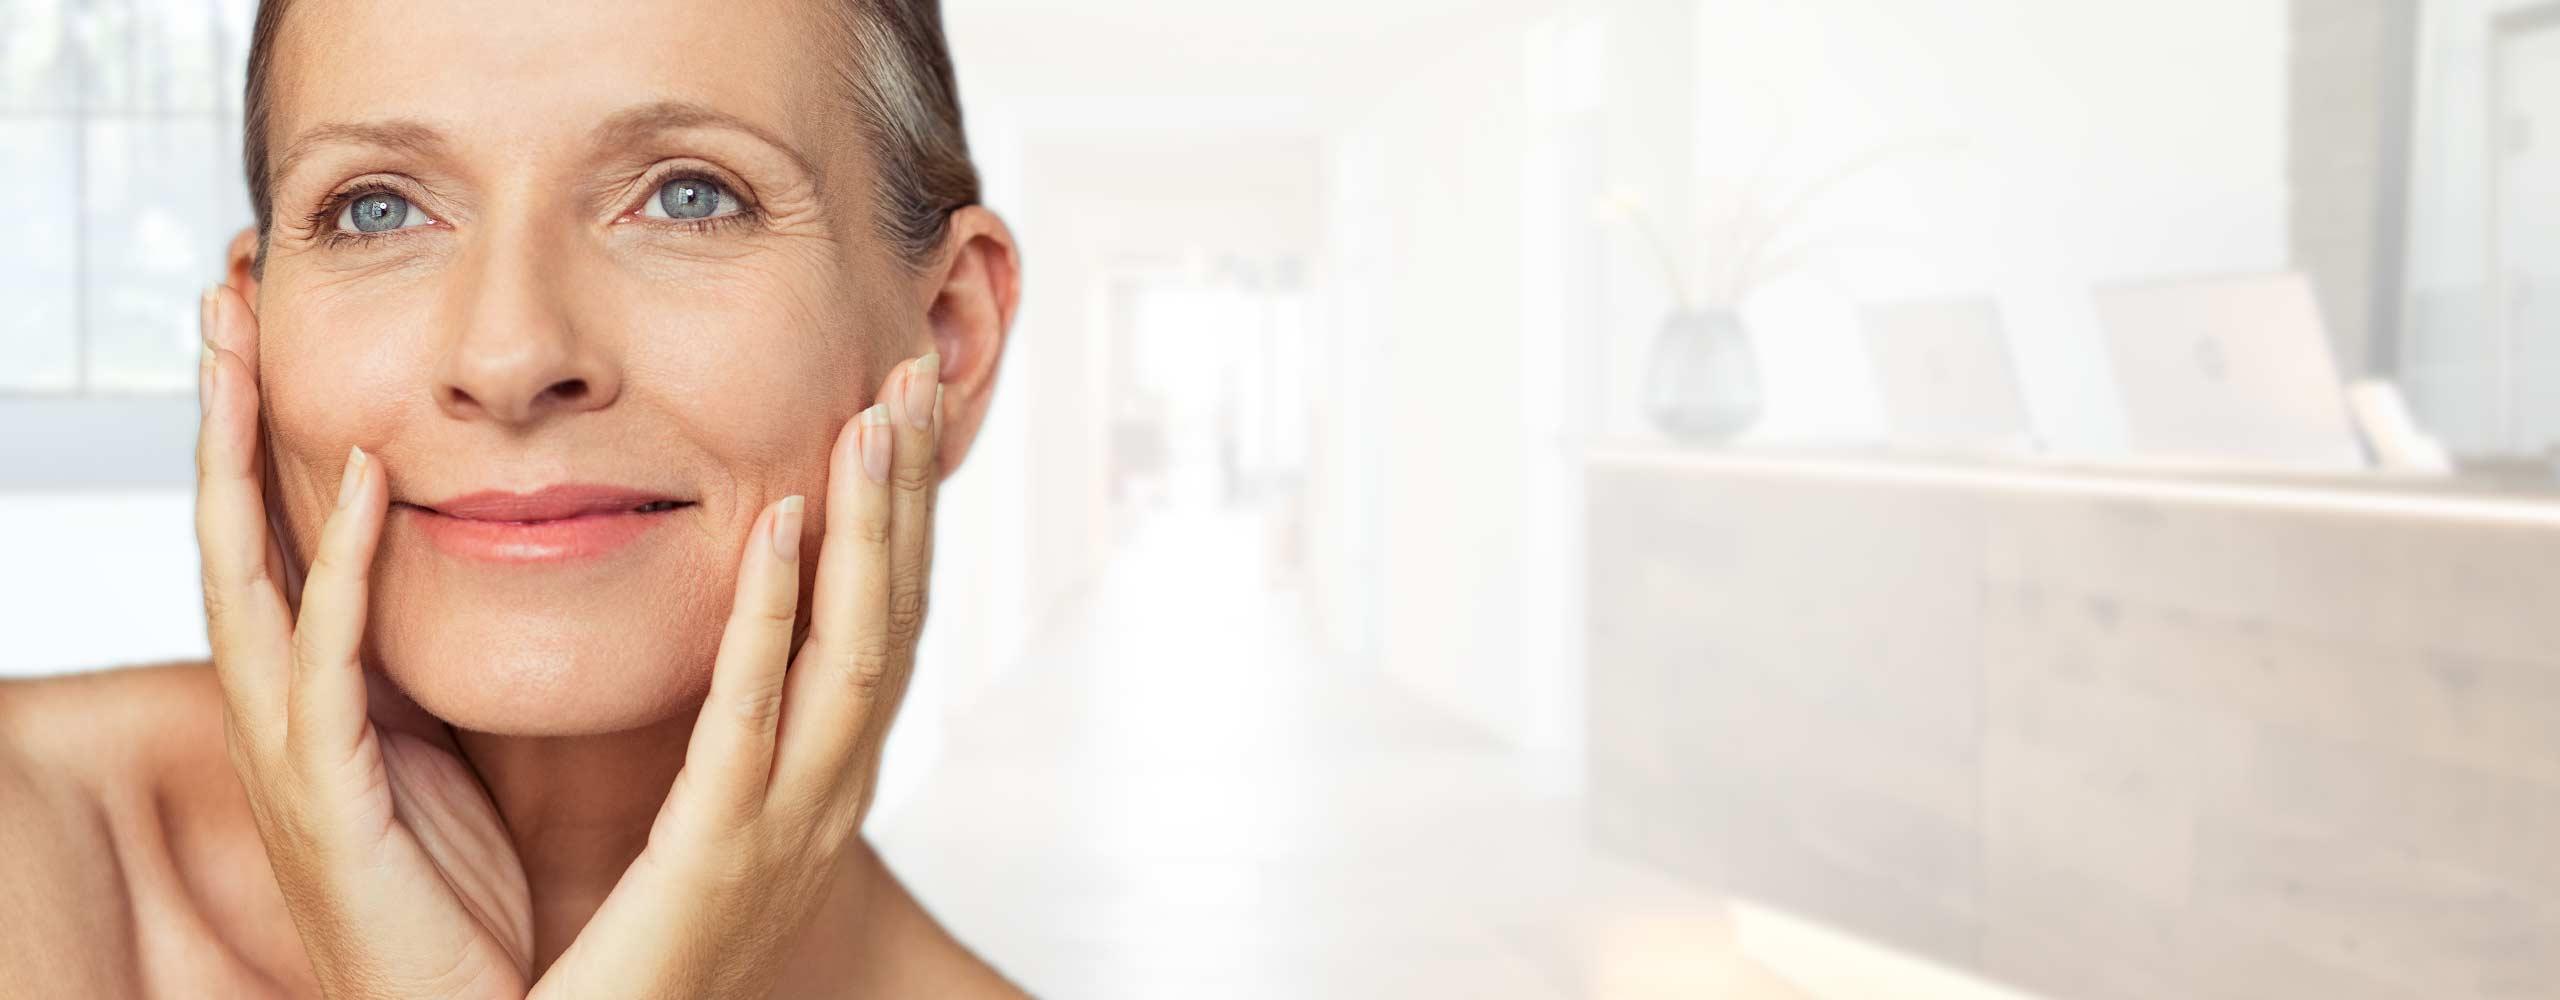 proaesthetic heidelberg schoenheitsklinik unterspritzungen raucherfalten